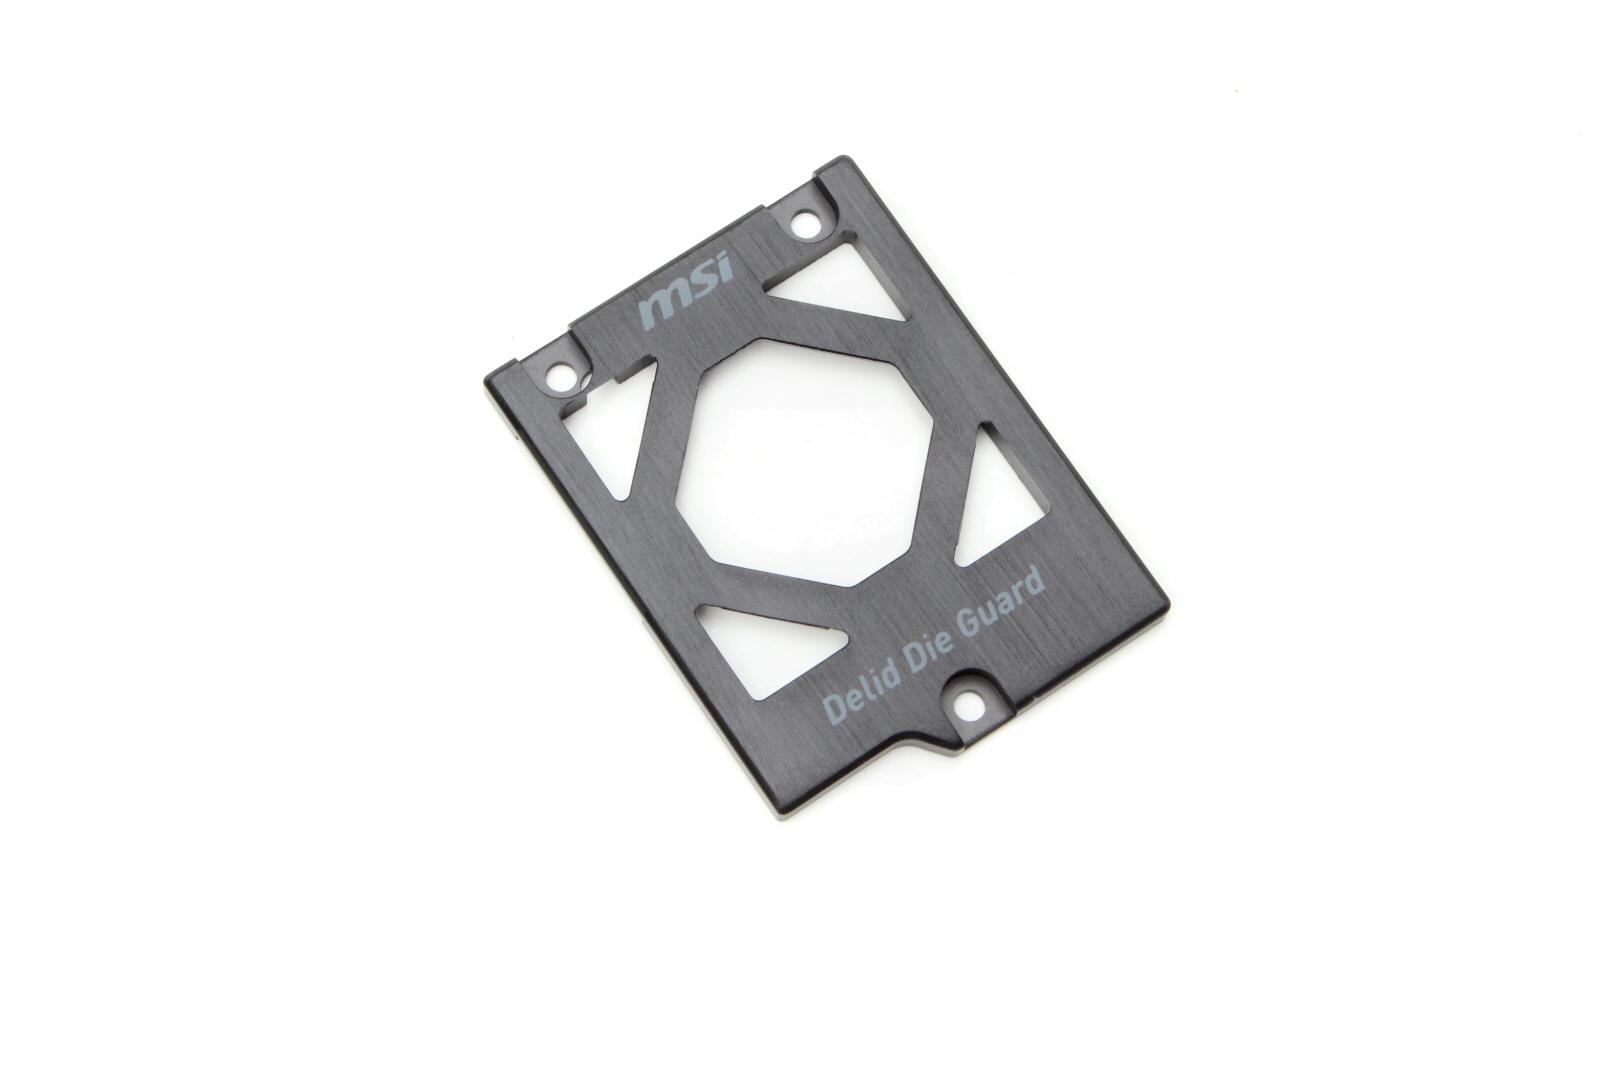 [Review] MSI Z97 XPower AC-img_5249.jpg